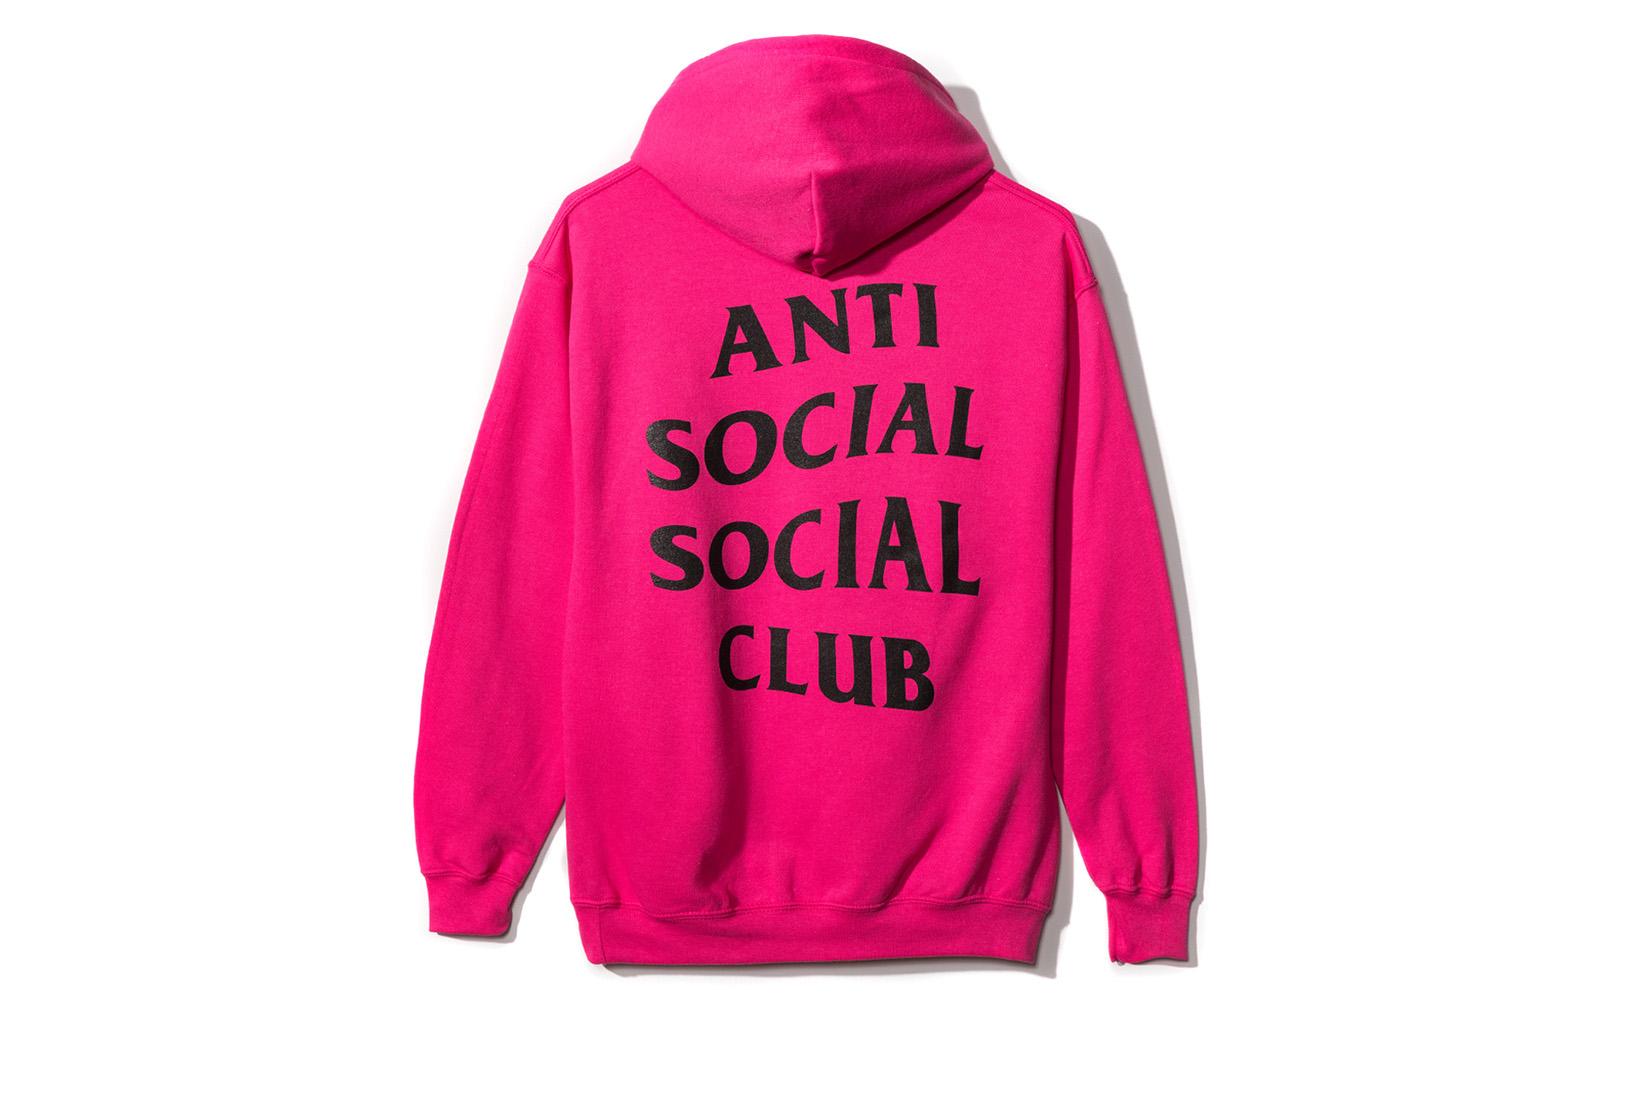 Anti Social Social Club 2017 Spring Summer - 3744330